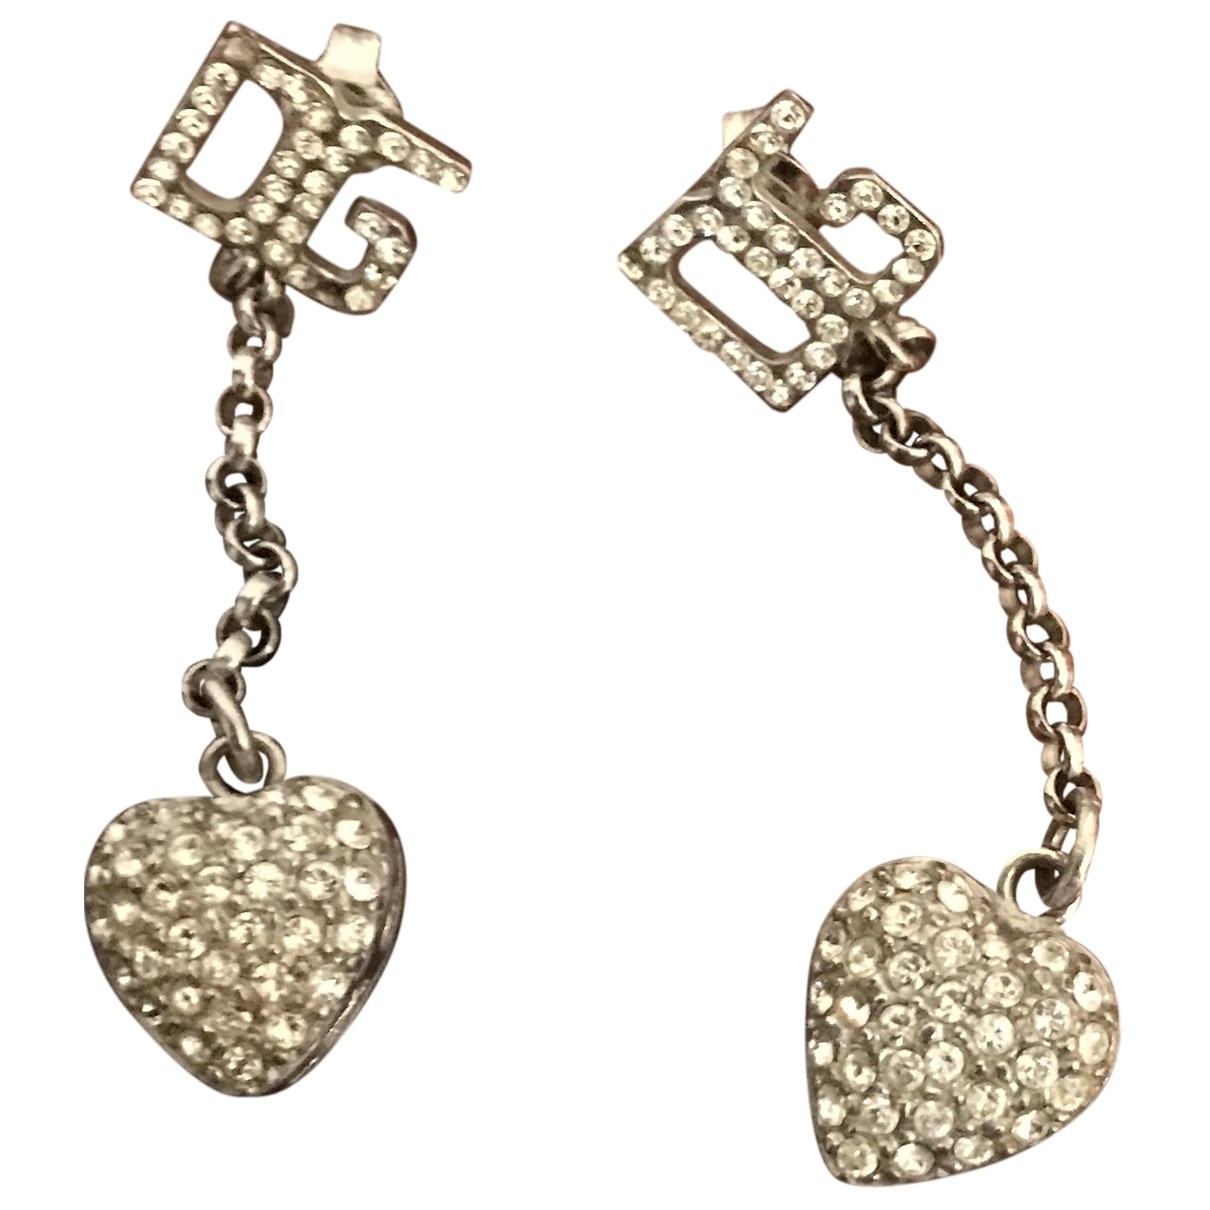 Dolce & Gabbana \N Anhaenger in  Grau Metall